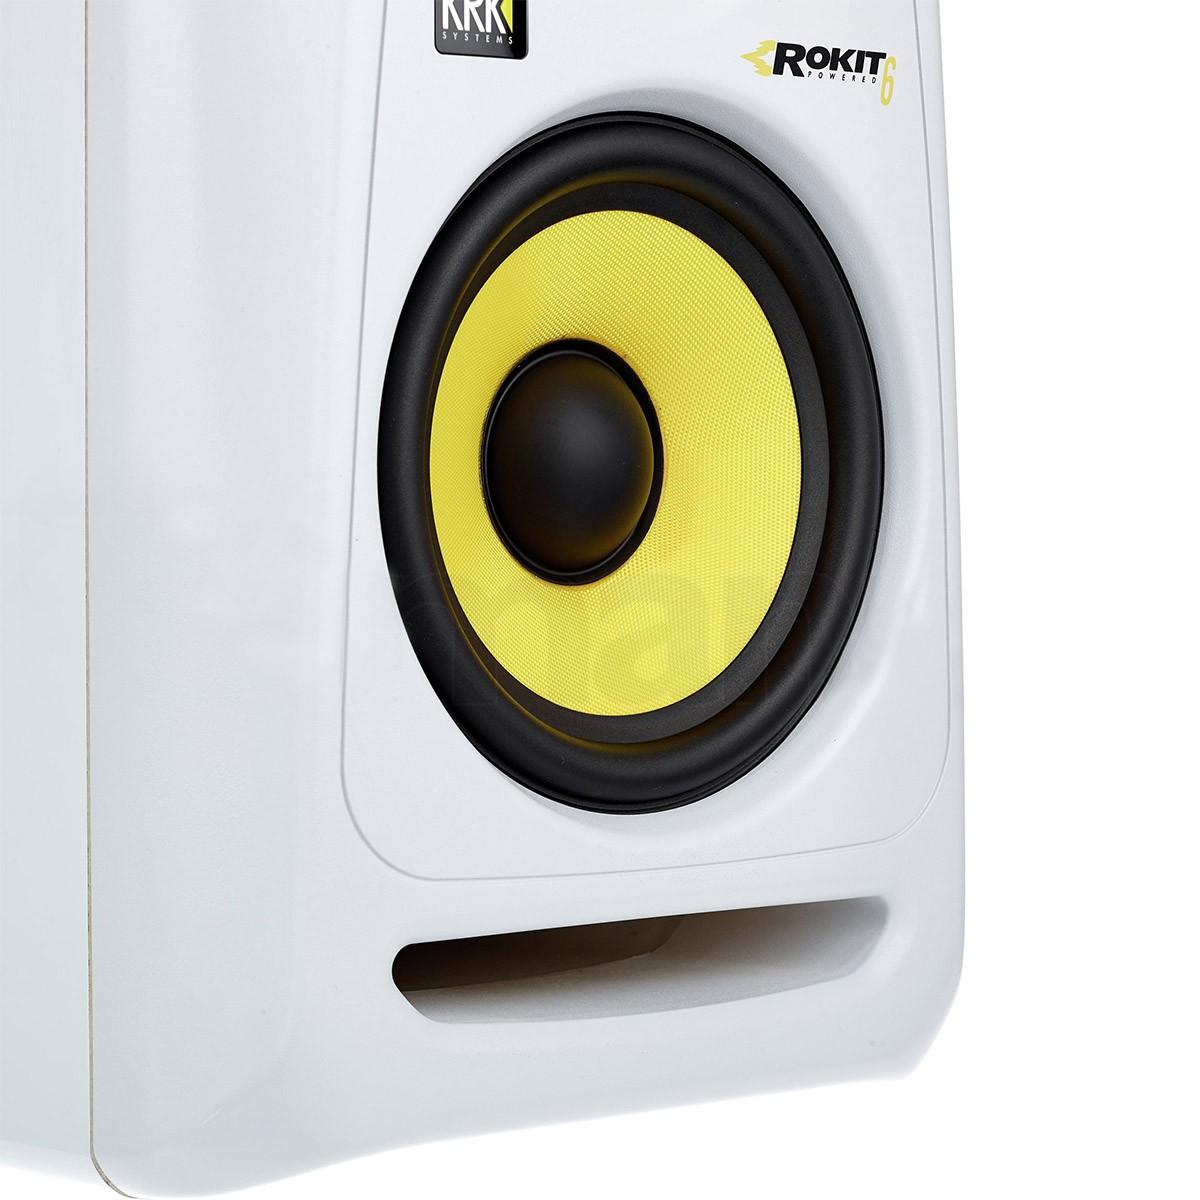 Krk RP6 G3 Rokit Powered Monitor de Audio Referencia para Estudio, Branco, 110v, Par